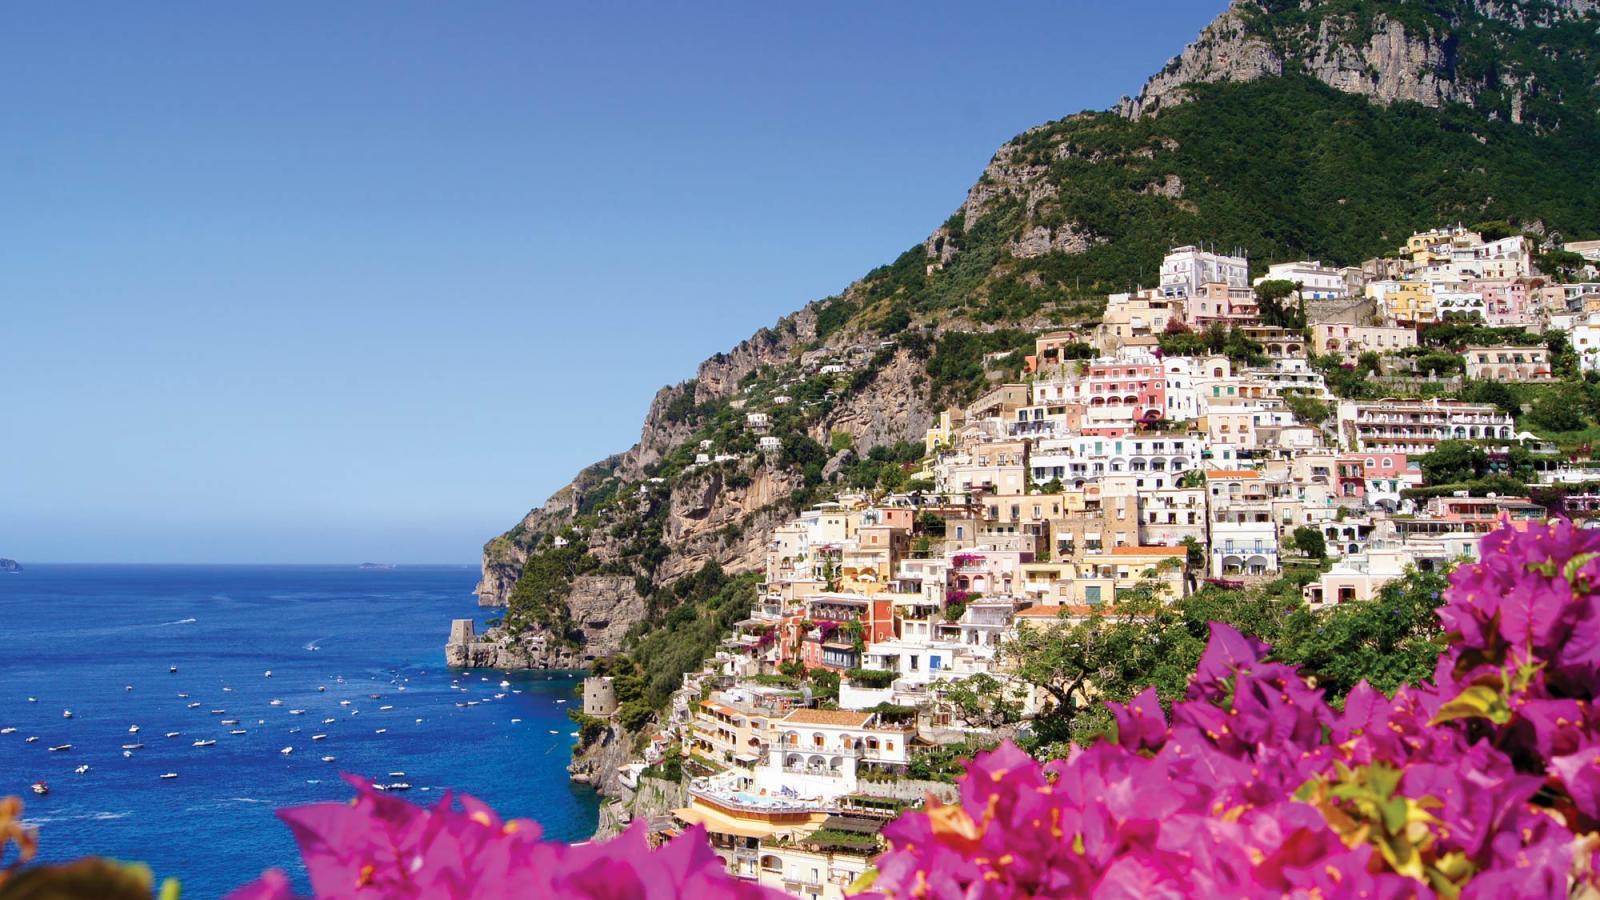 Sorrento the amalfi coast holidays 2017 topflight for Amalfi to positano